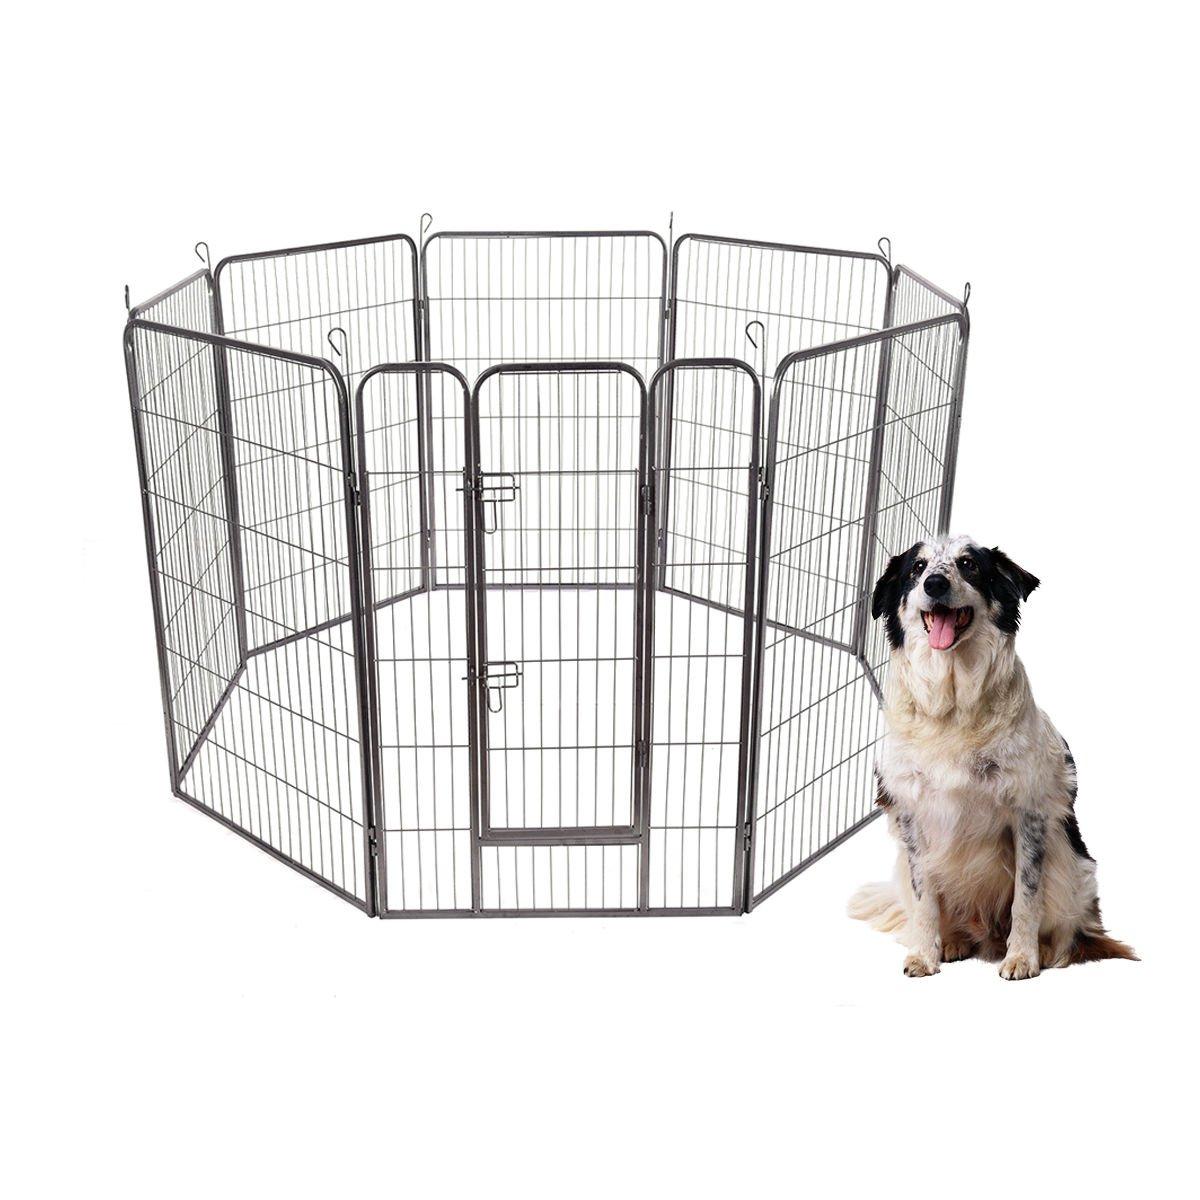 Safstar 48''/40''/32''/24'' High 8 Panels Pet Playpen Dog Pets Fence Exercise Pen Gate with Door (48 Inch) by Safstar